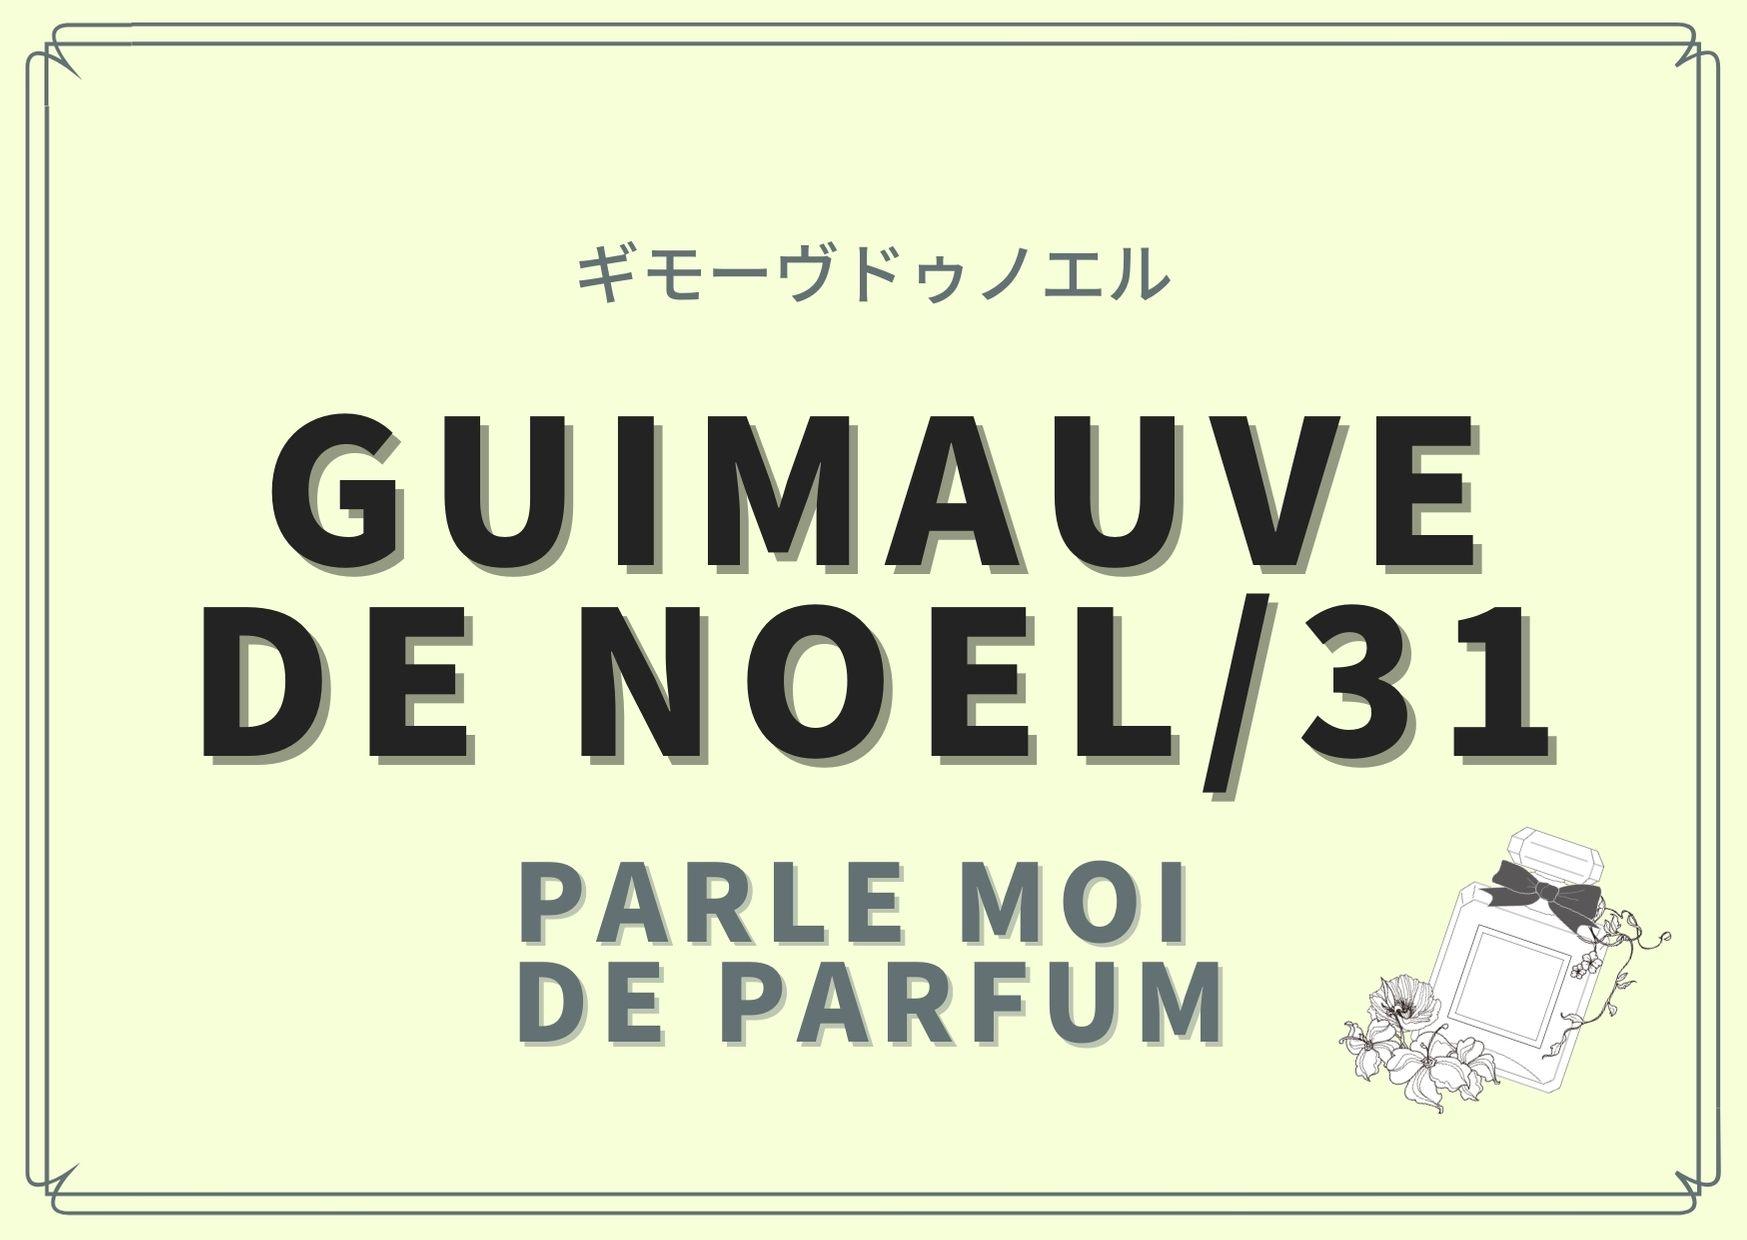 GUIMAUVE DE NOEL/31(ギモーヴドゥノエル )/PARLE MOI DE PARFUM(パルル モア ドゥ パルファム)